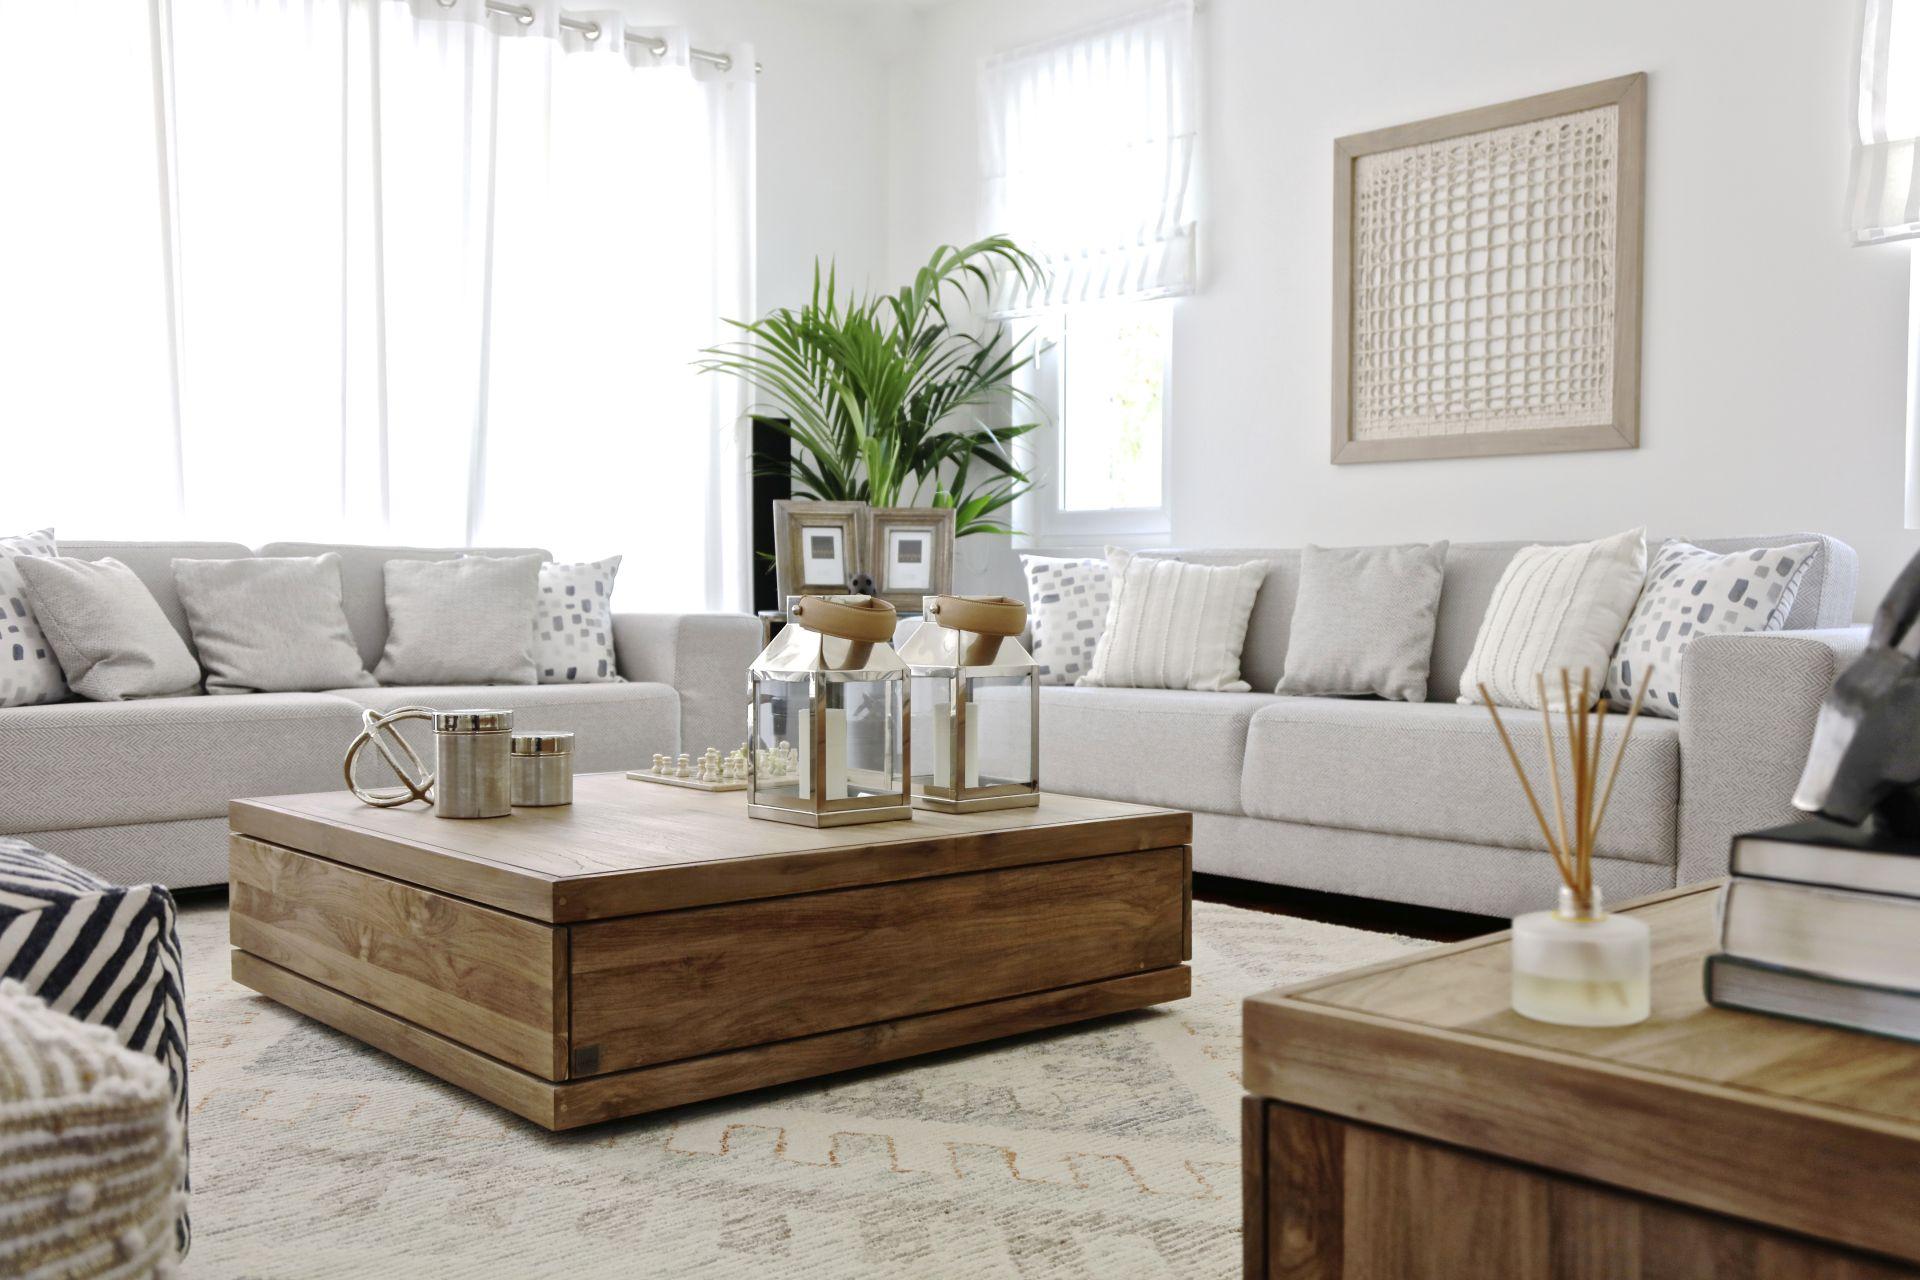 Villa Designs: Private Residence, Arabian Ranches - Love That Design